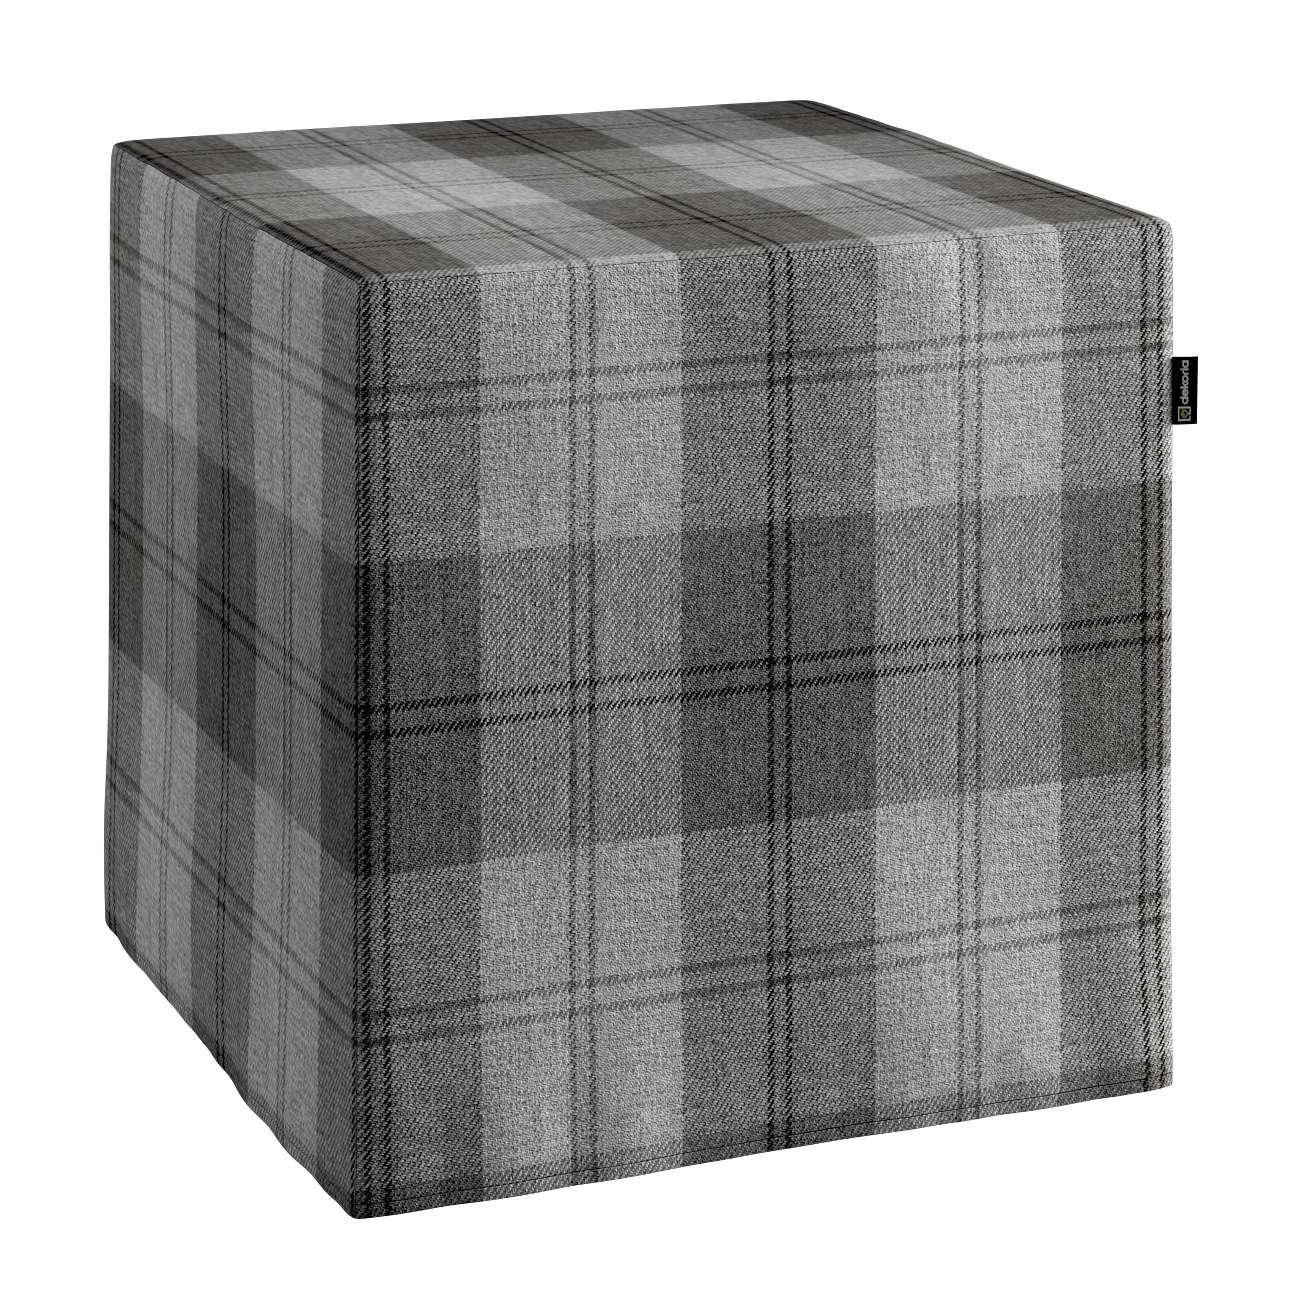 Pufa kostka w kolekcji Edinburgh, tkanina: 115-75